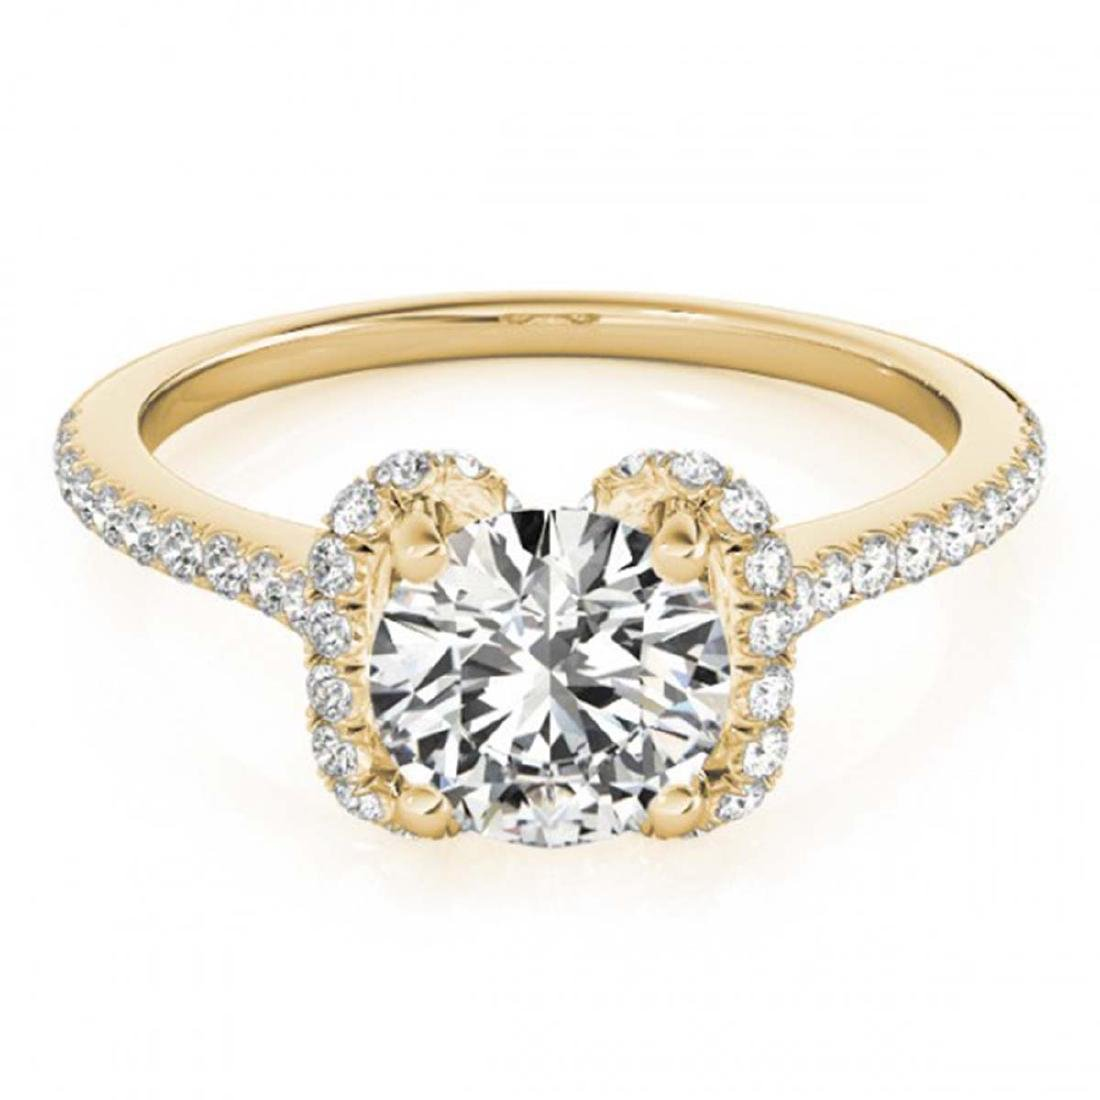 1.33 ctw VS/SI Diamond Halo Ring 18K Yellow Gold -